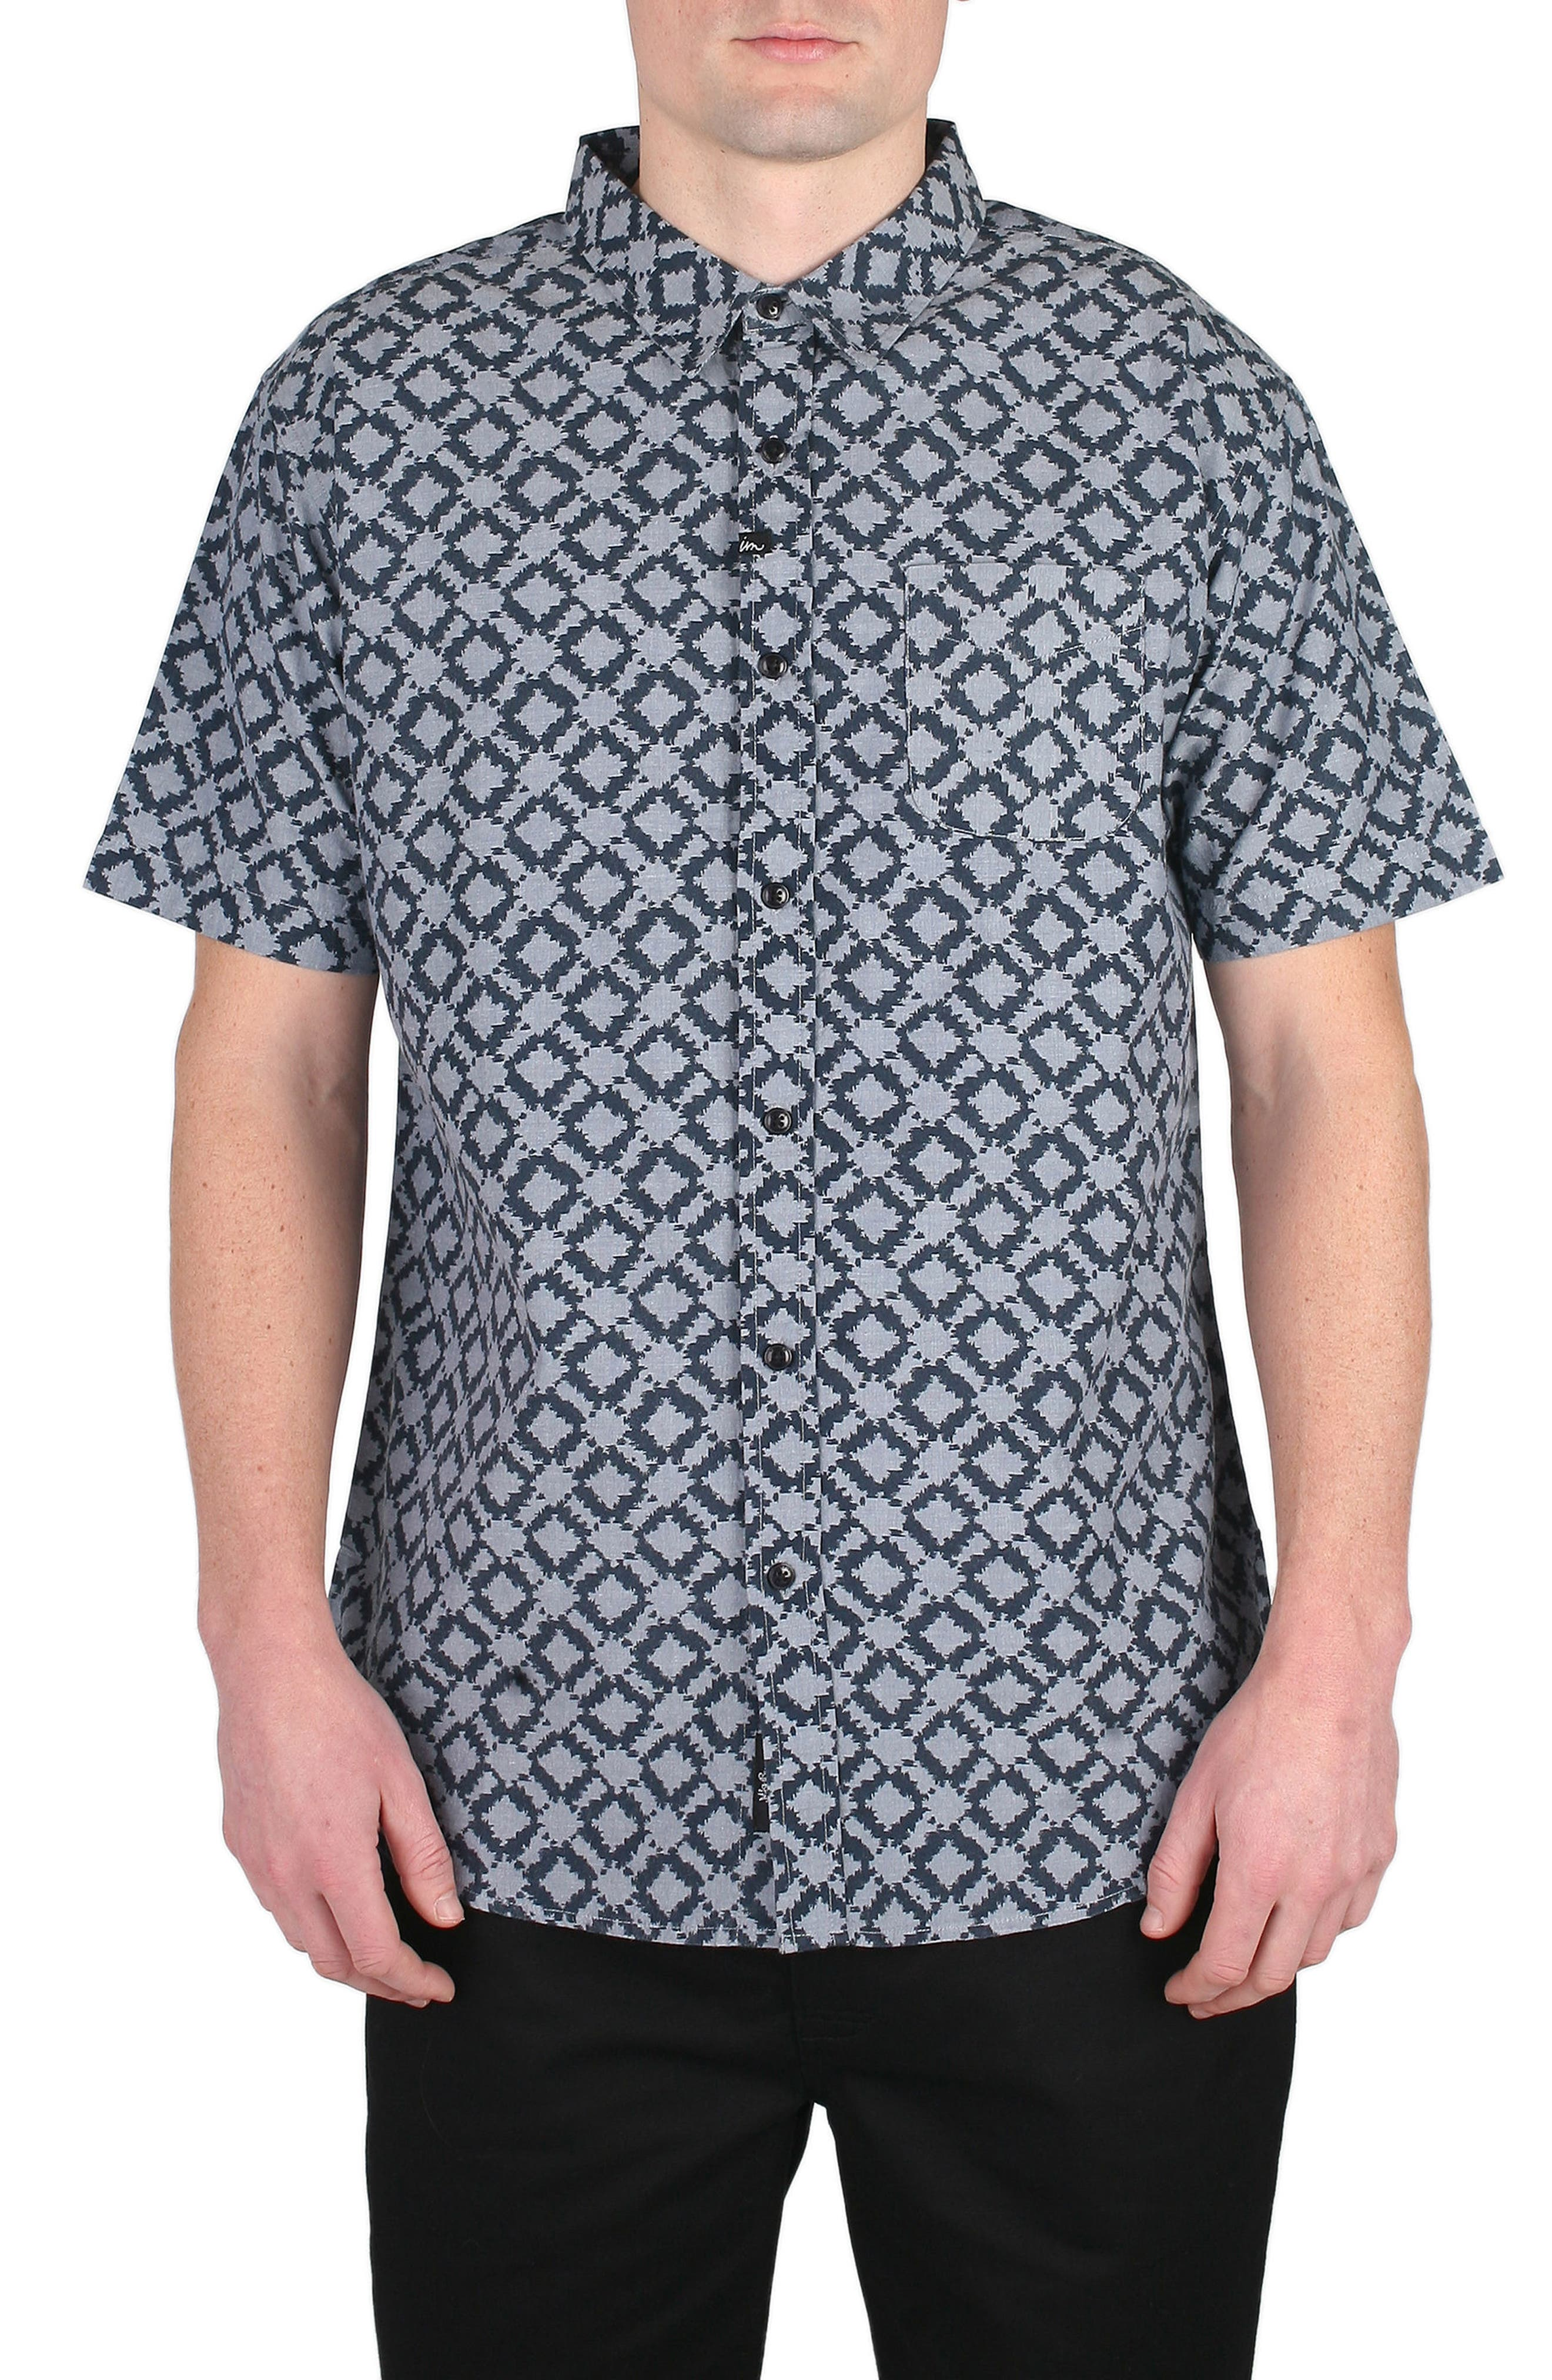 Alternate Image 1 Selected - Imperial Motion Mezcal Print Shirt